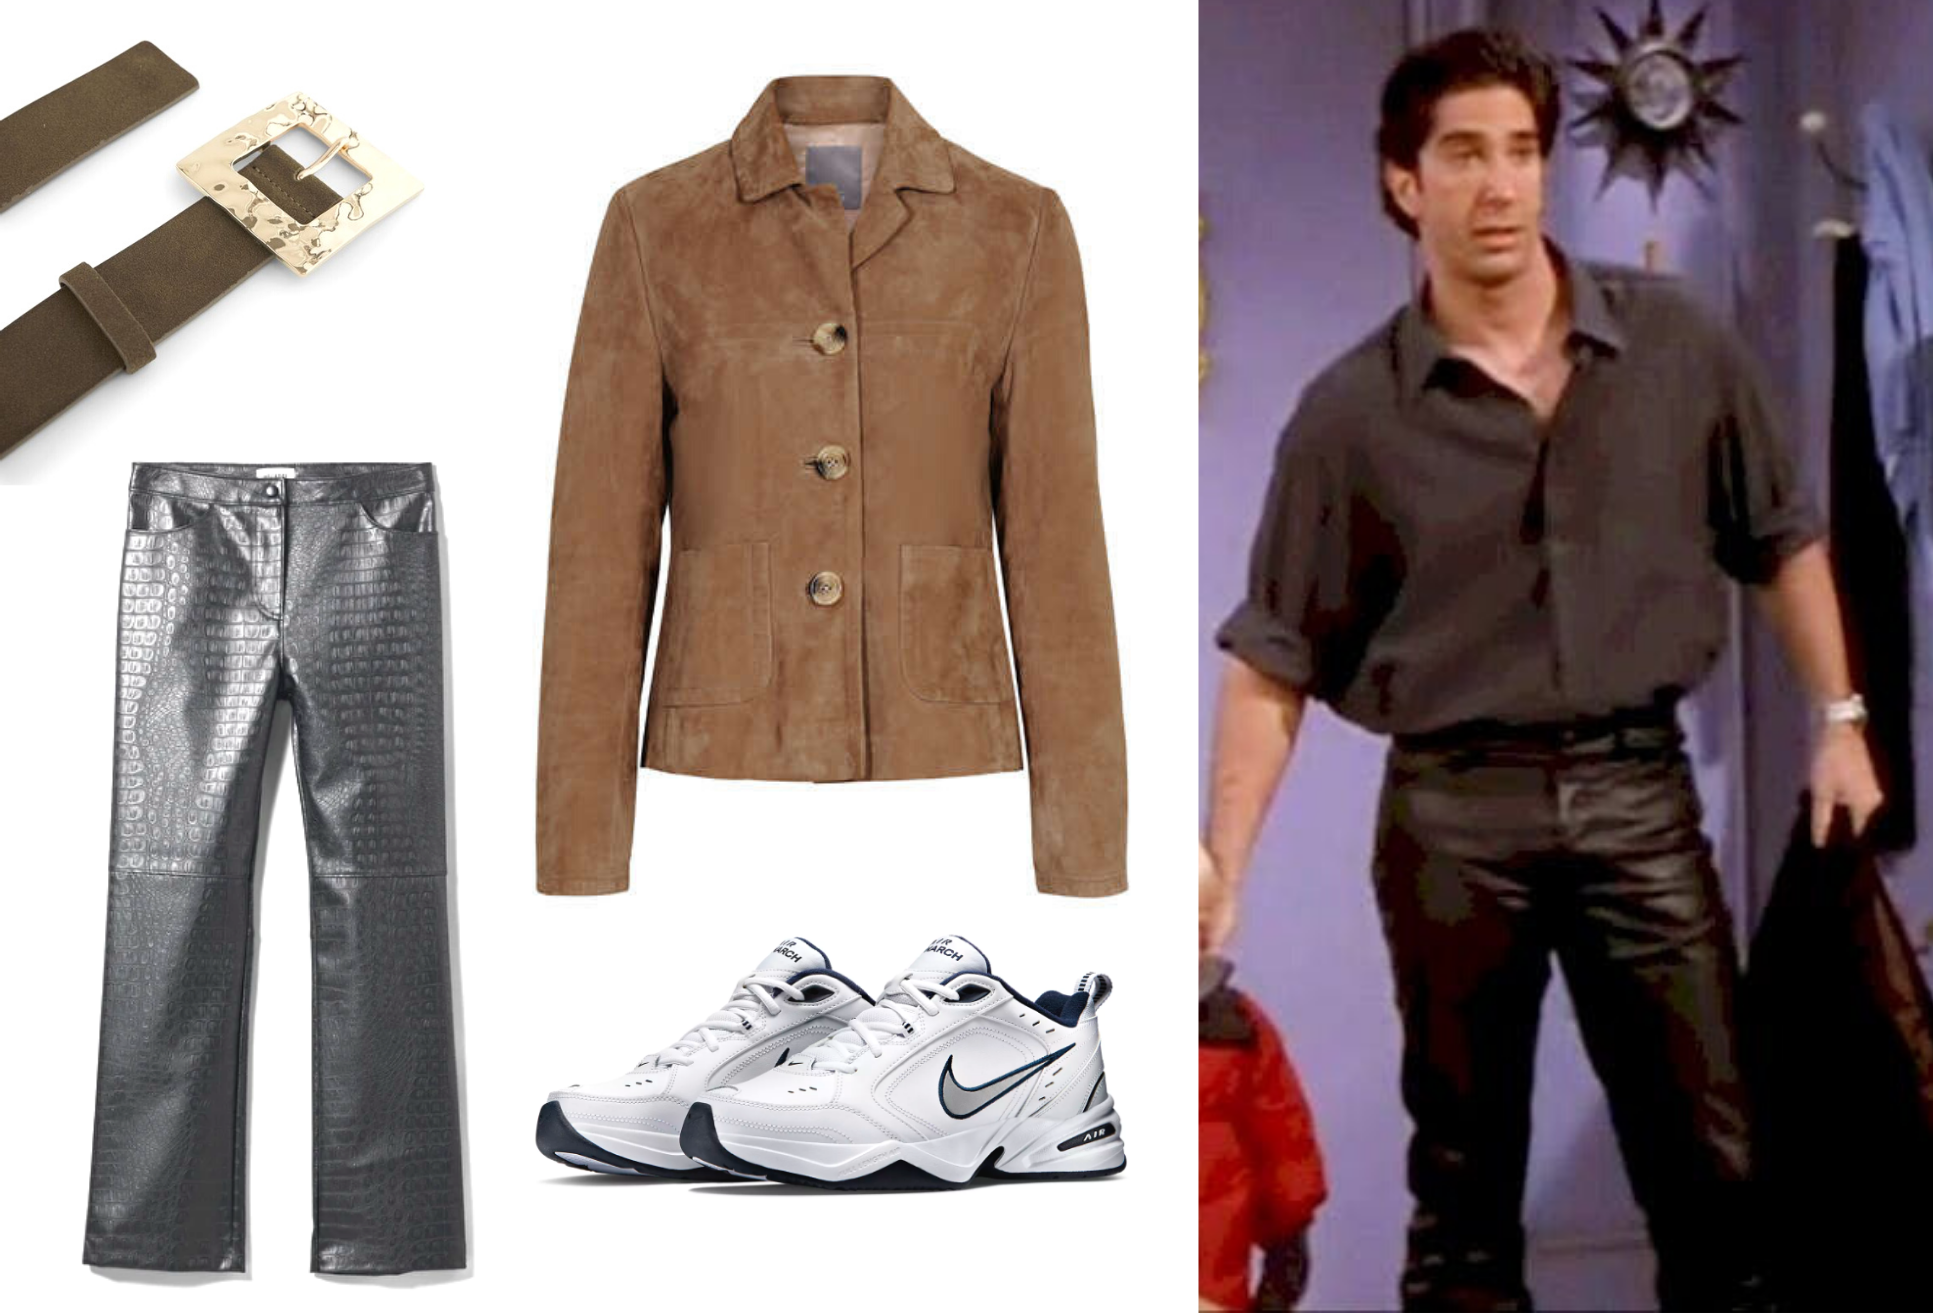 Ross, modig, stilet, inspiration, mode, fashion, Friends. (Kollage: MY DAILY SPACE)